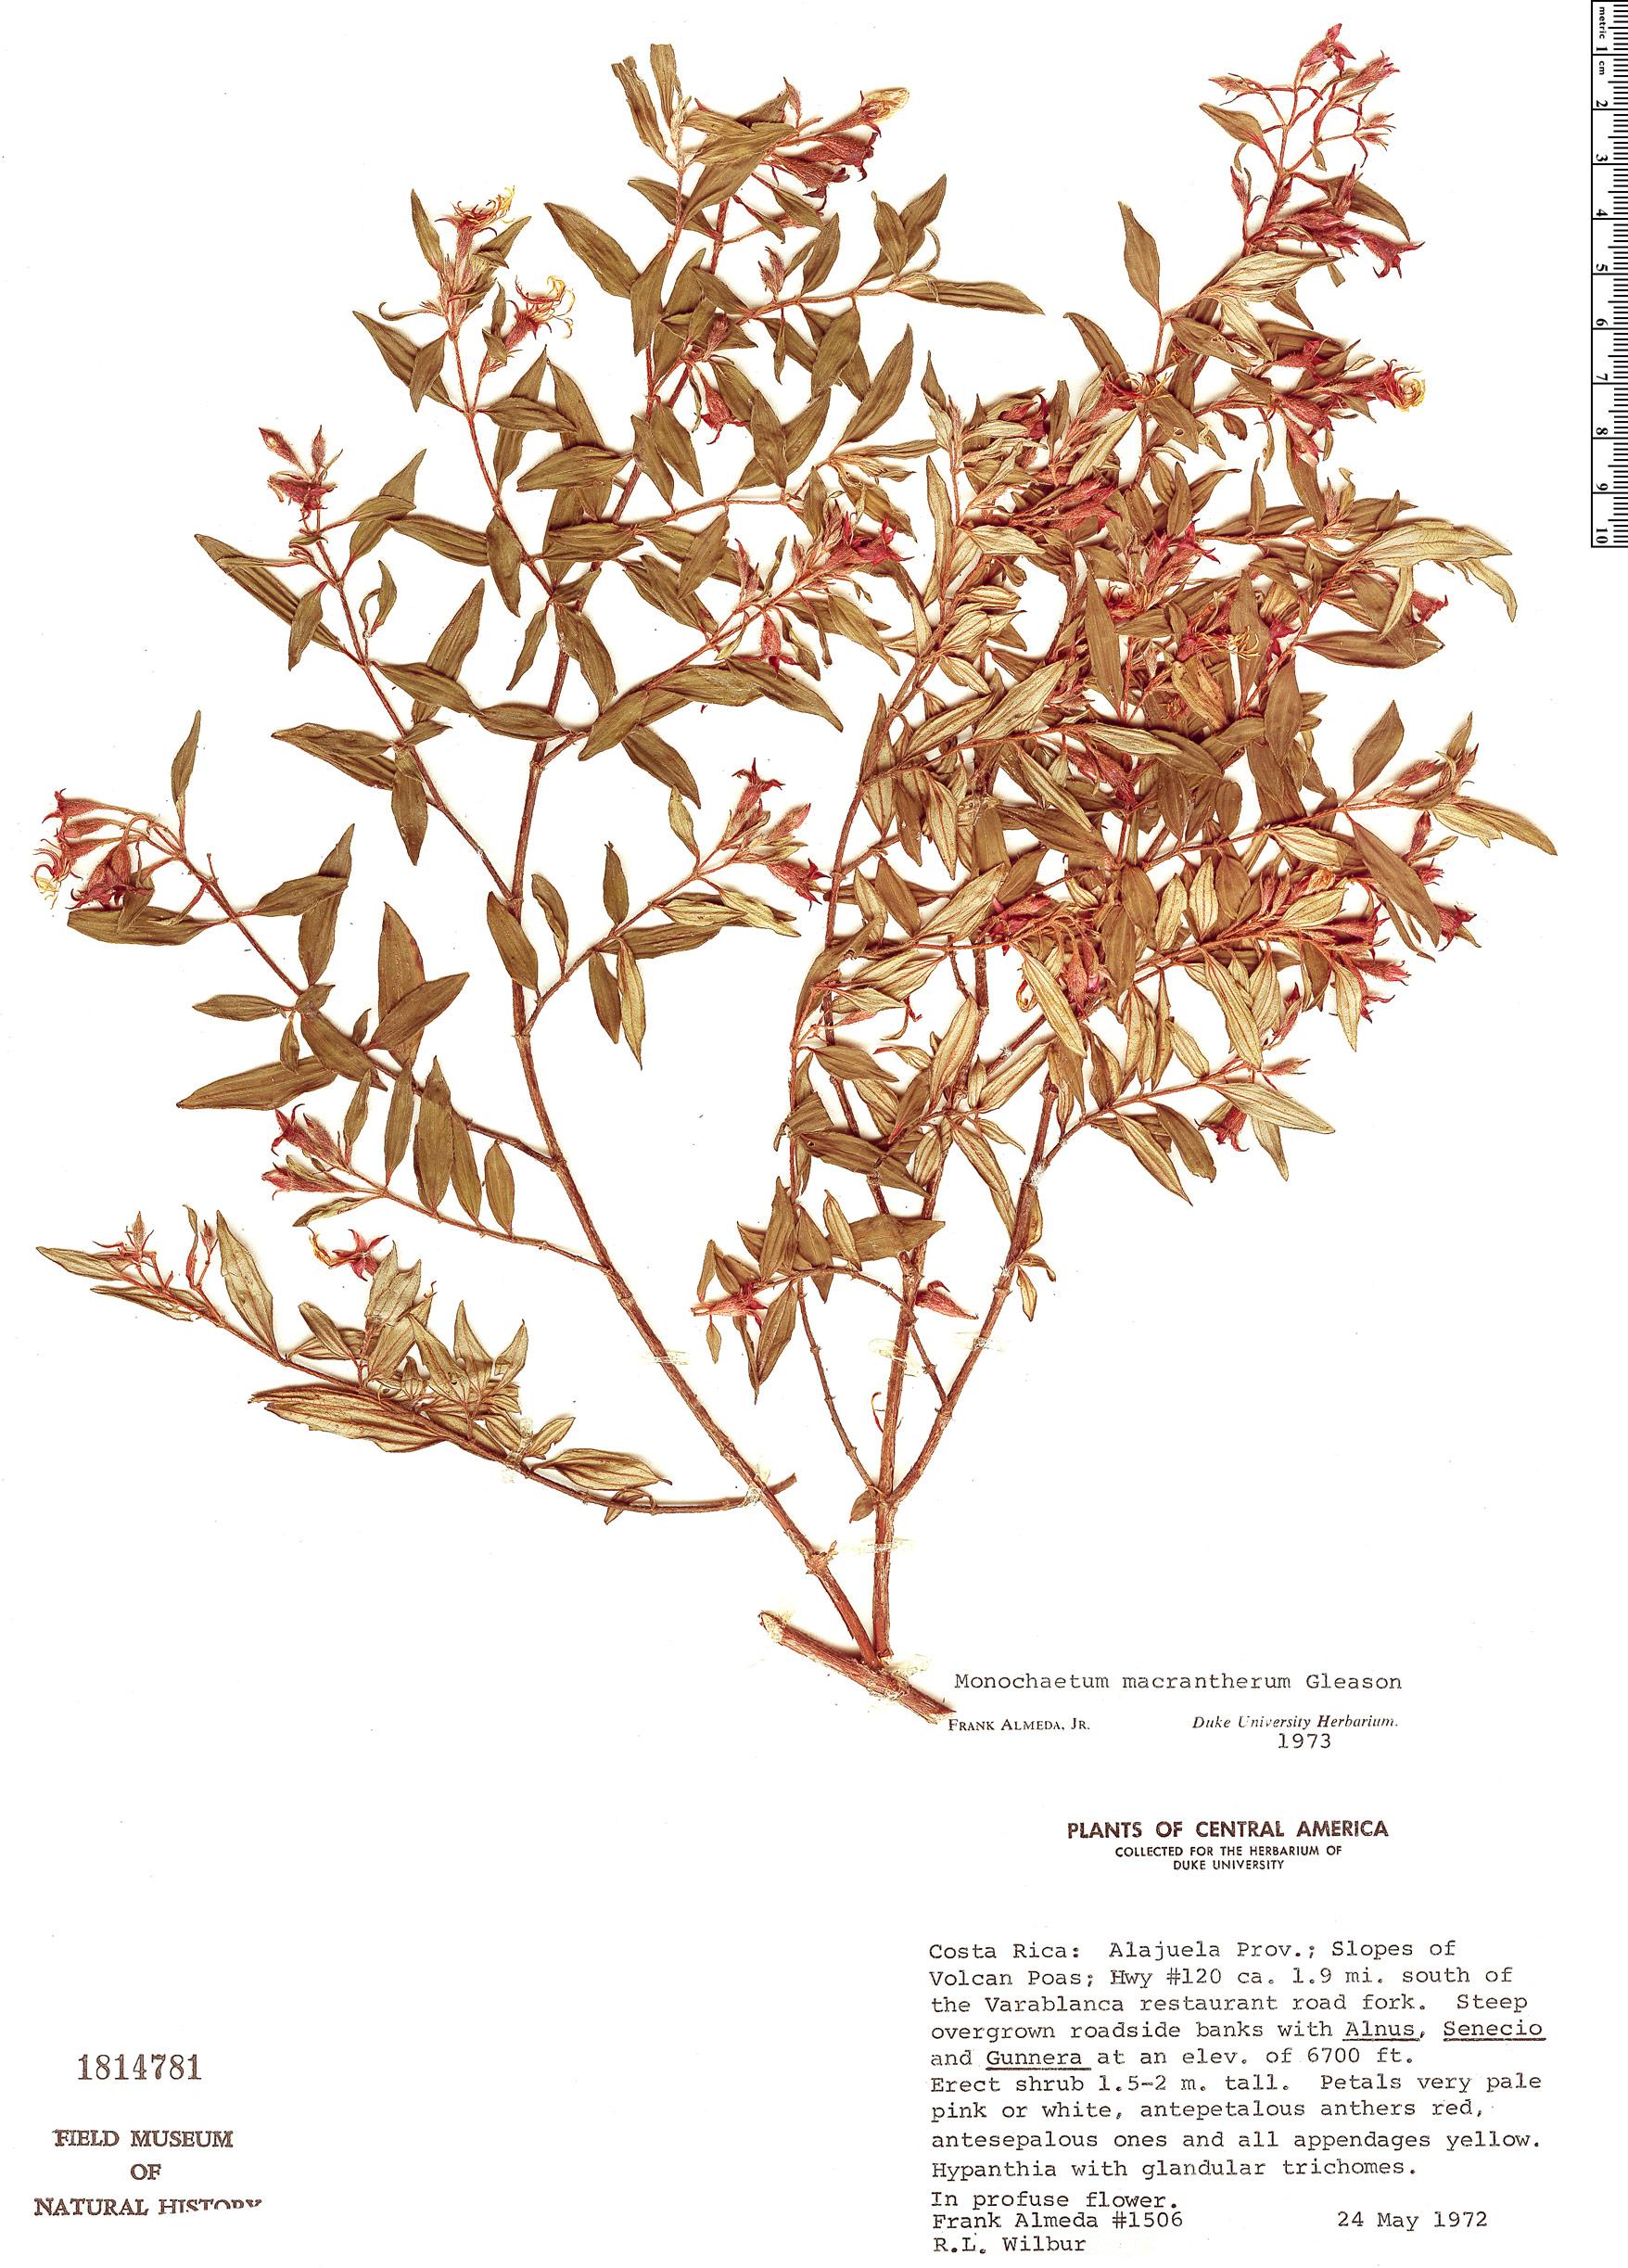 Specimen: Monochaetum macrantherum